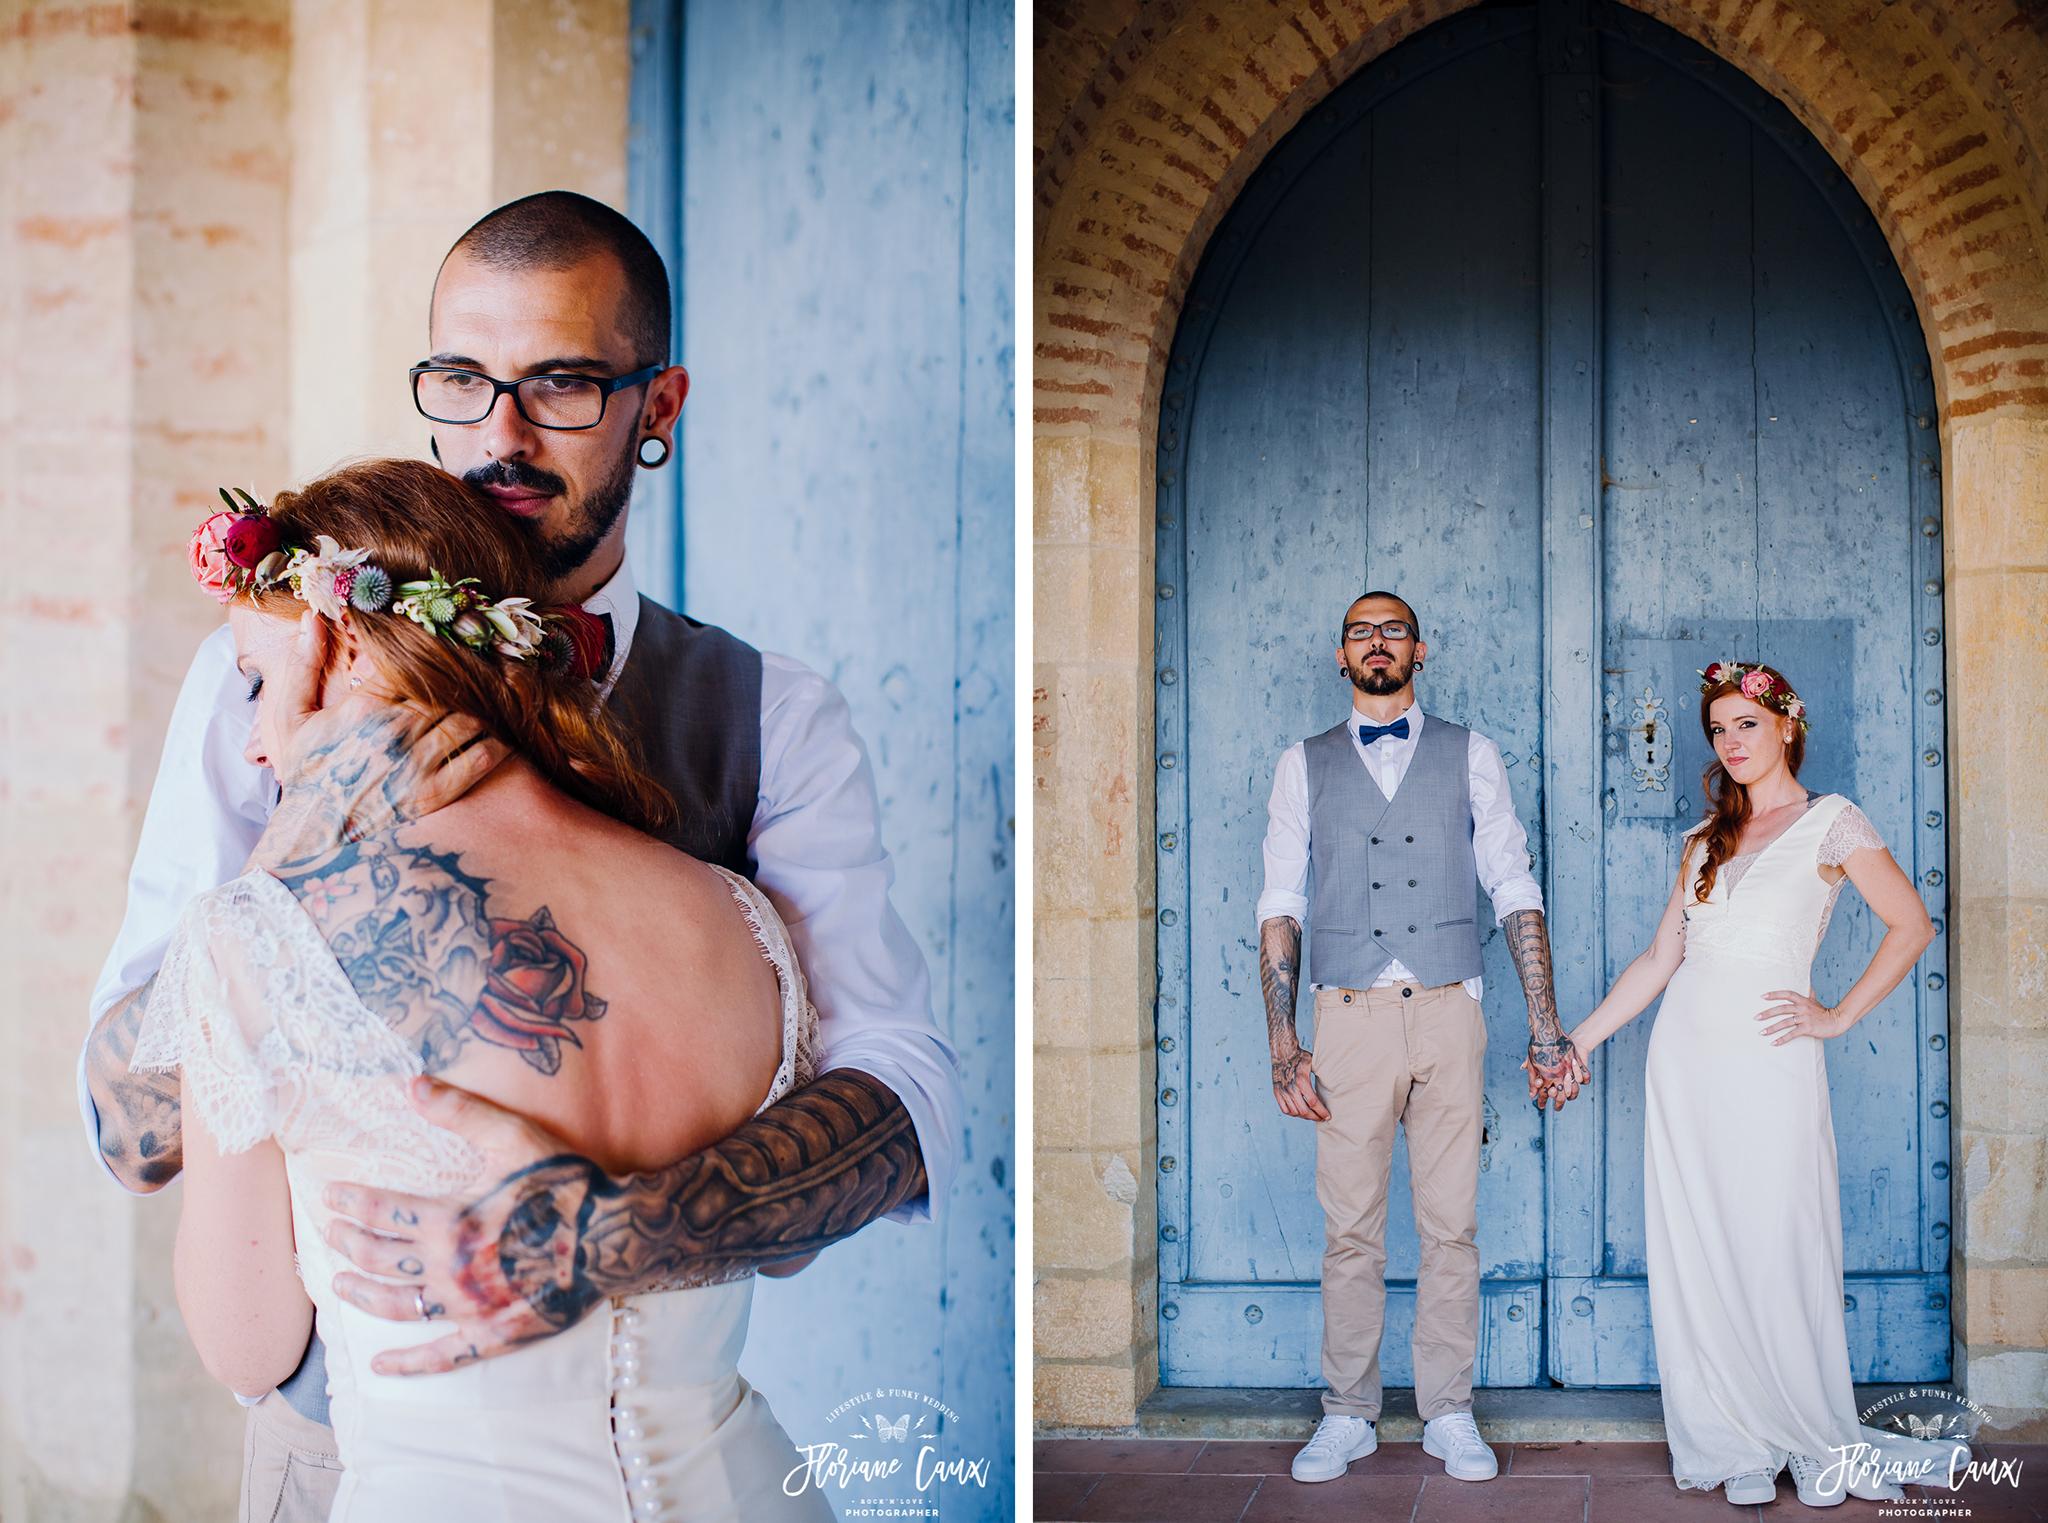 photographe-mariage-toulouse-rocknroll-maries-tatoues-floriane-caux-53